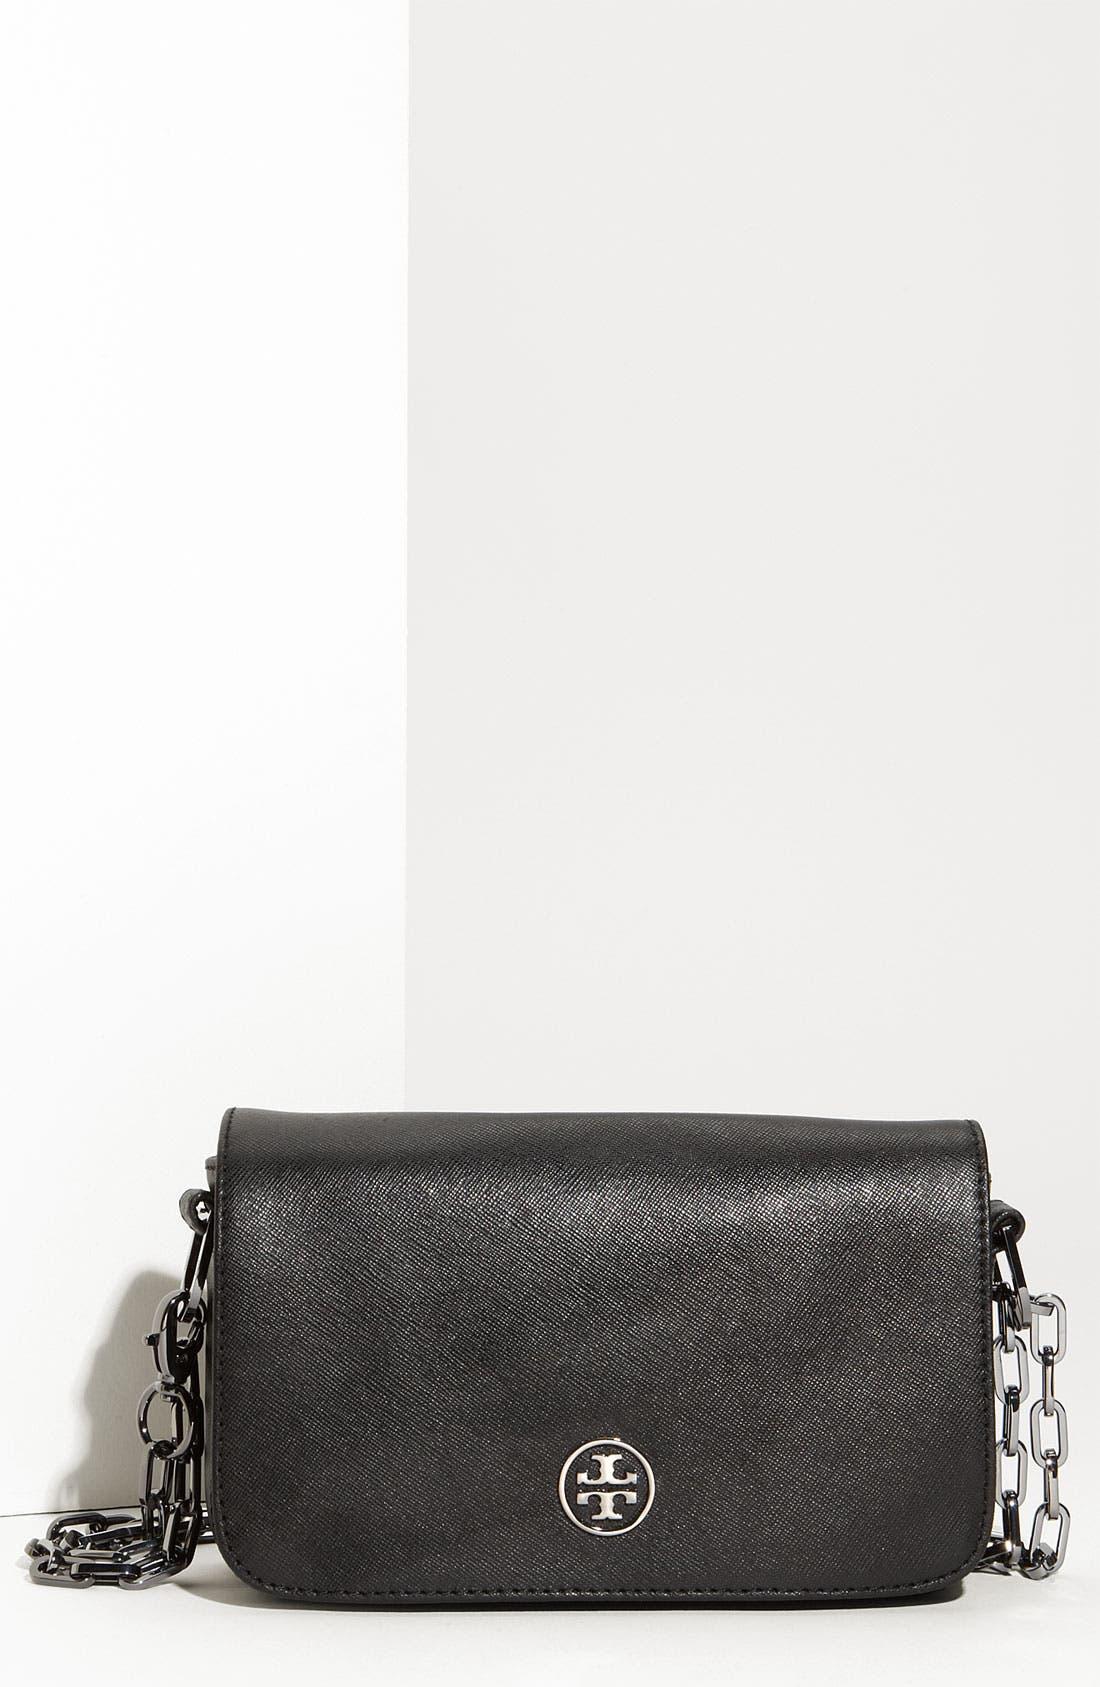 Alternate Image 1 Selected - Tory Burch 'Robinson - Mini' Crossbody Bag